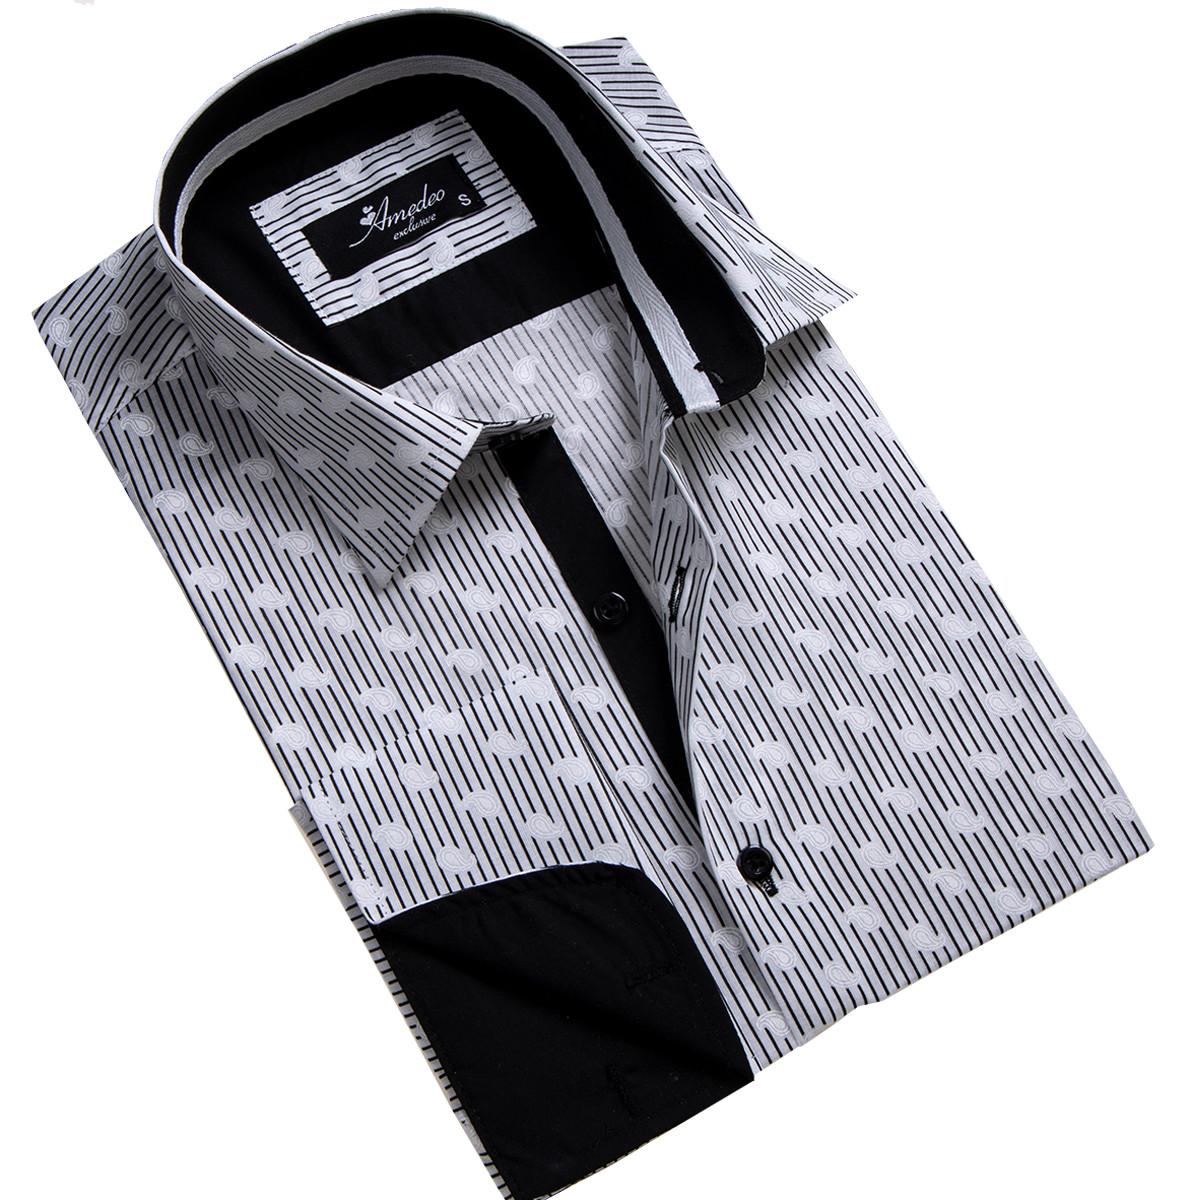 European Made & Designed Reversible Cuff Premium French Cuff Dress Shirt - black & white lines